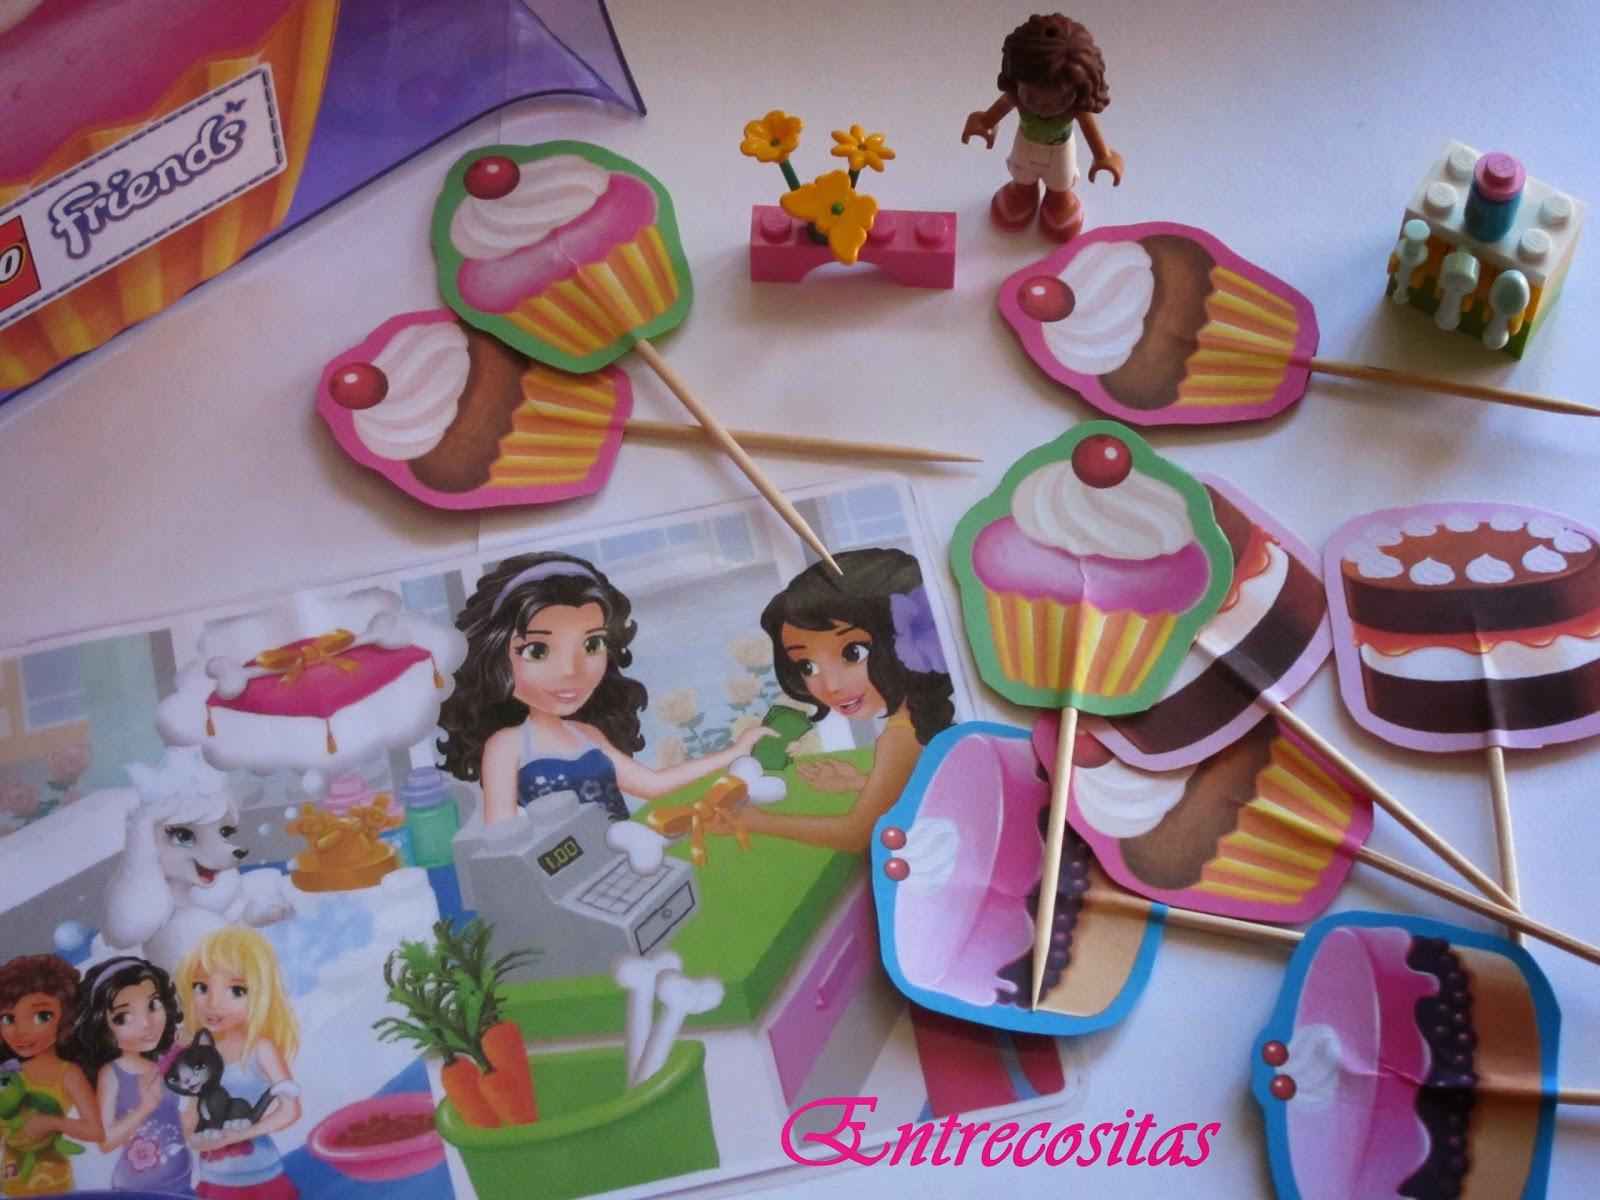 Accesorios para fiesta de cumplea os de lego friends - Fiesta sorpresa de cumpleanos para nina ...